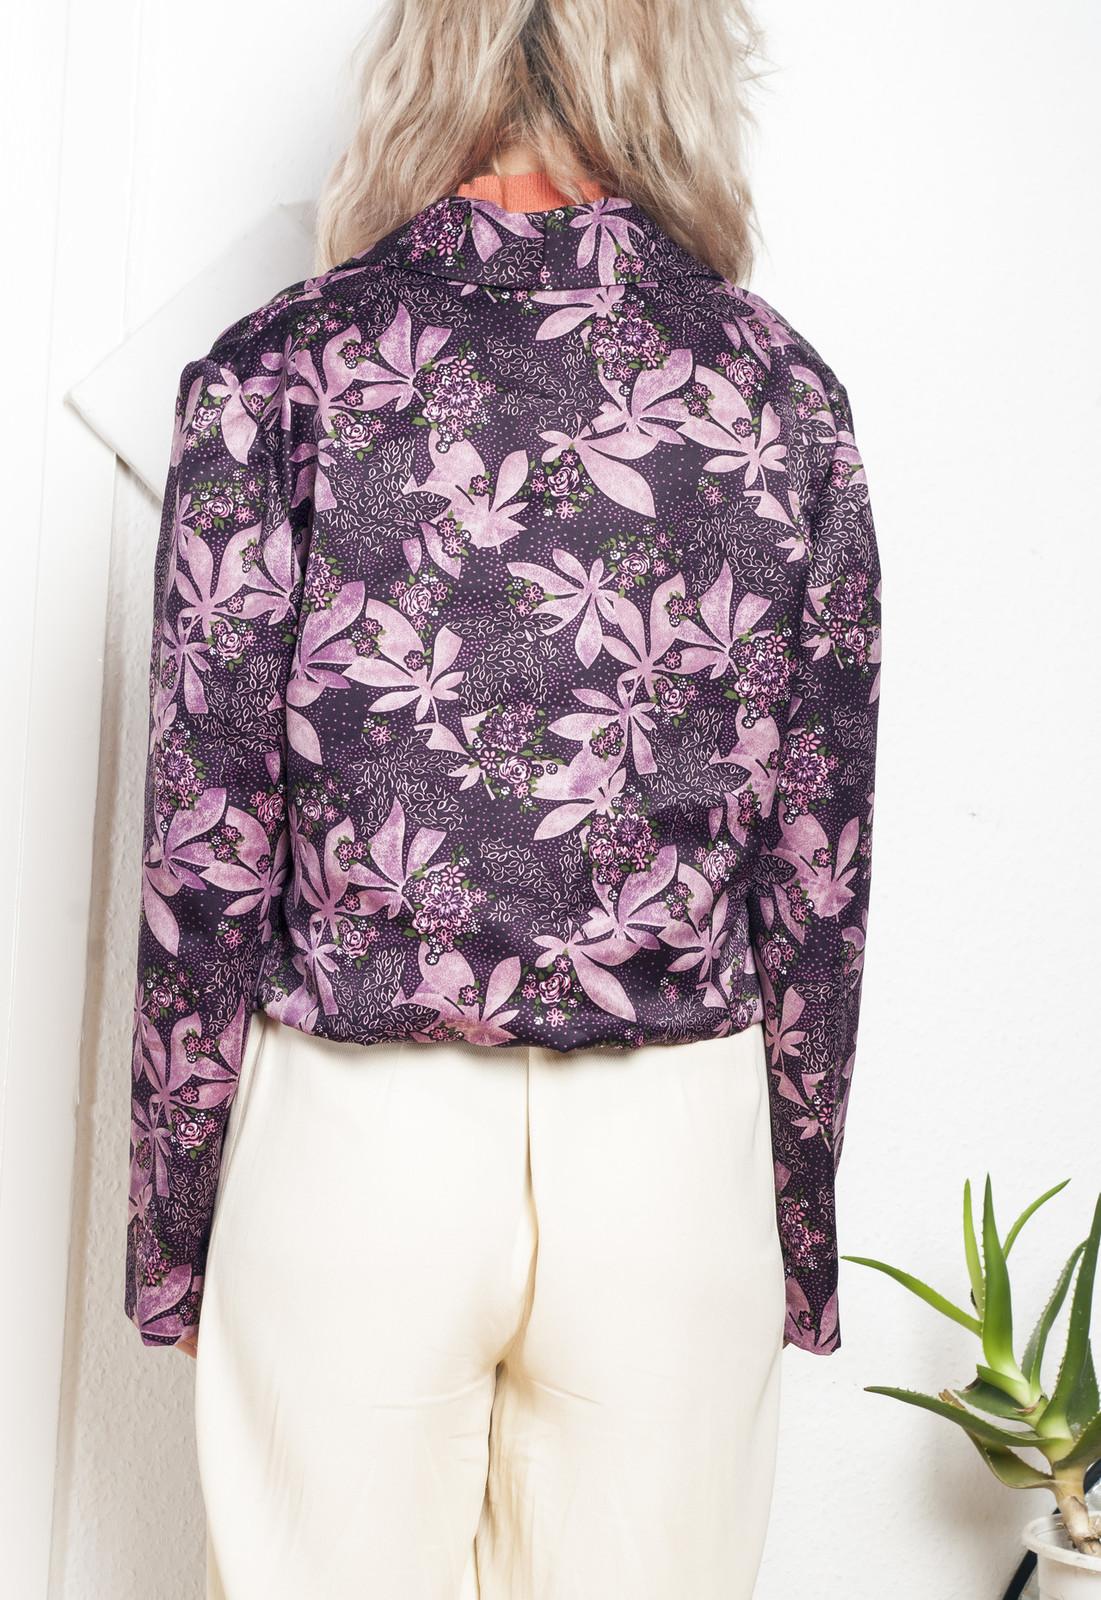 Psychedelic blazer - 60s vintage jacket